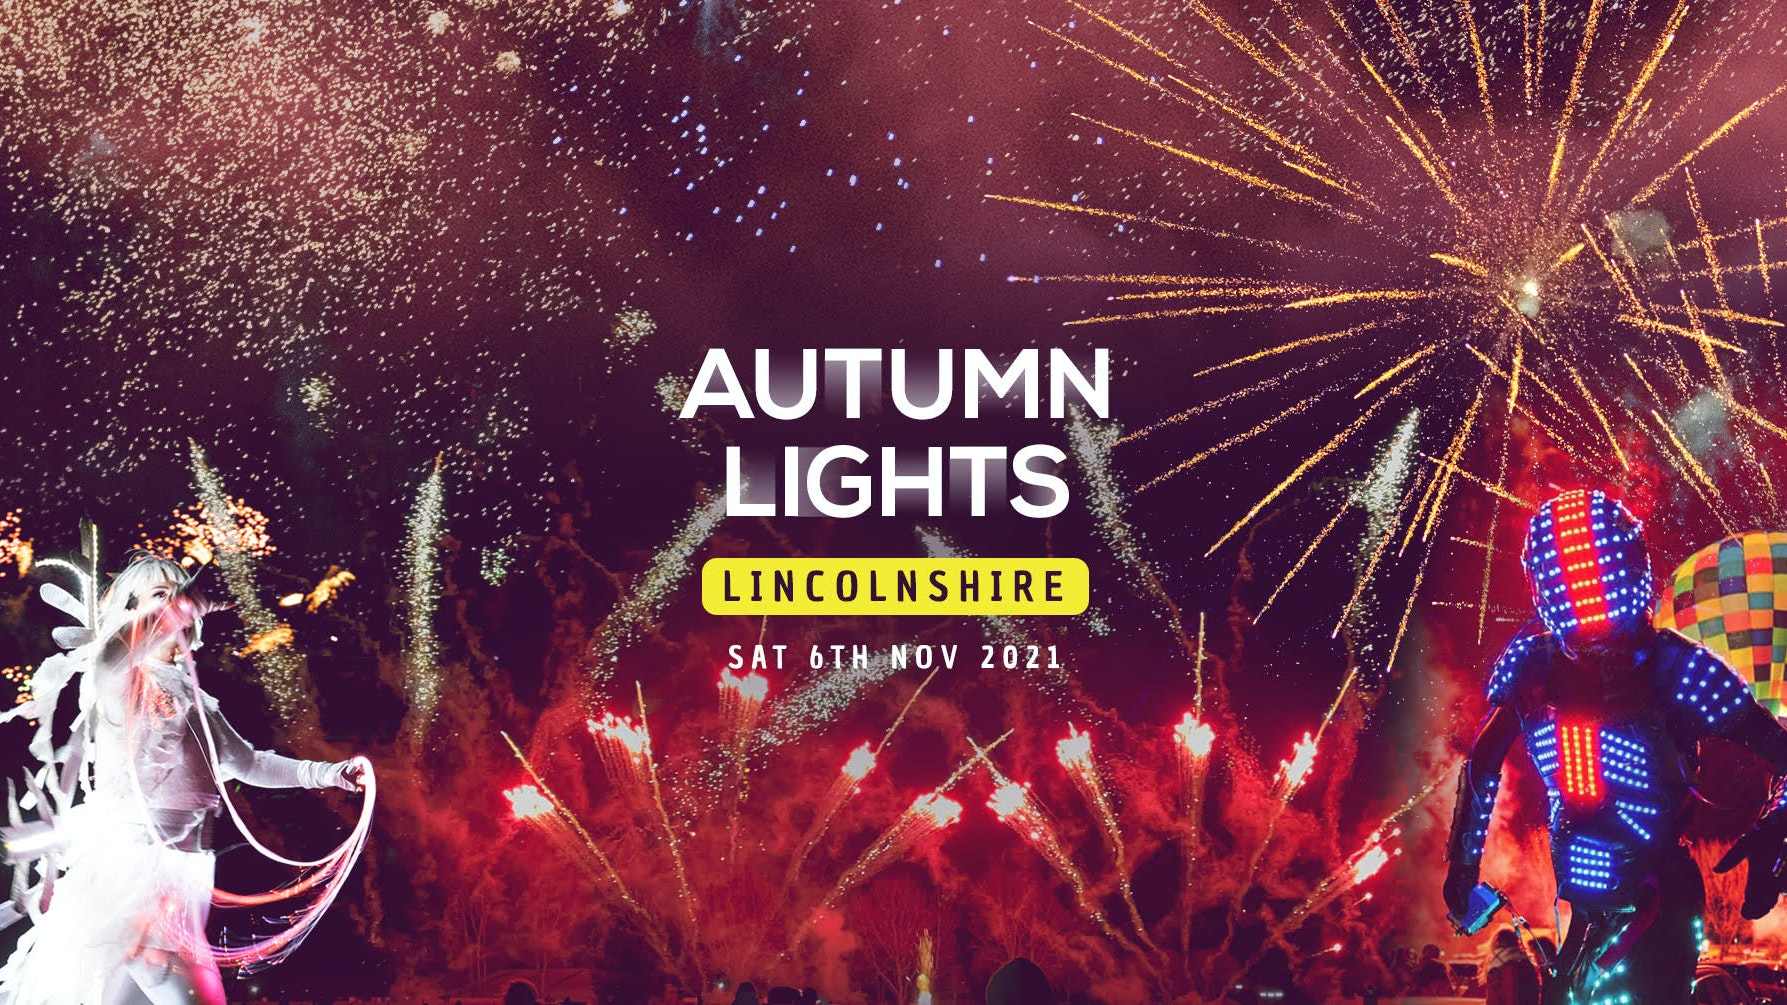 Autumn Lights – Lincoln 2021